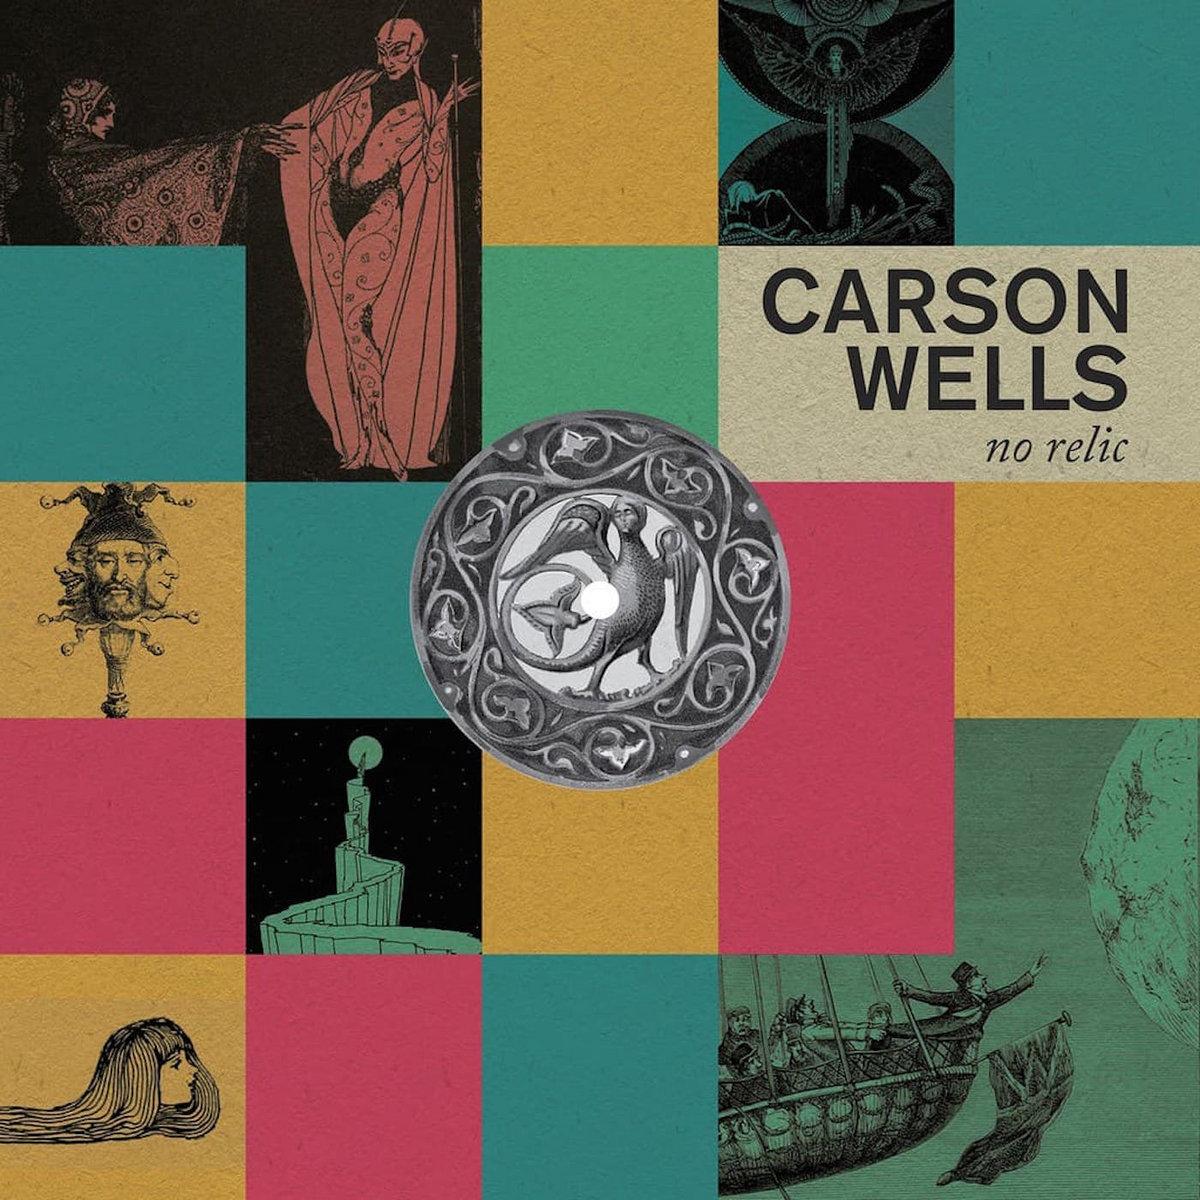 Carson Wells - No Relic [EP] (2018)